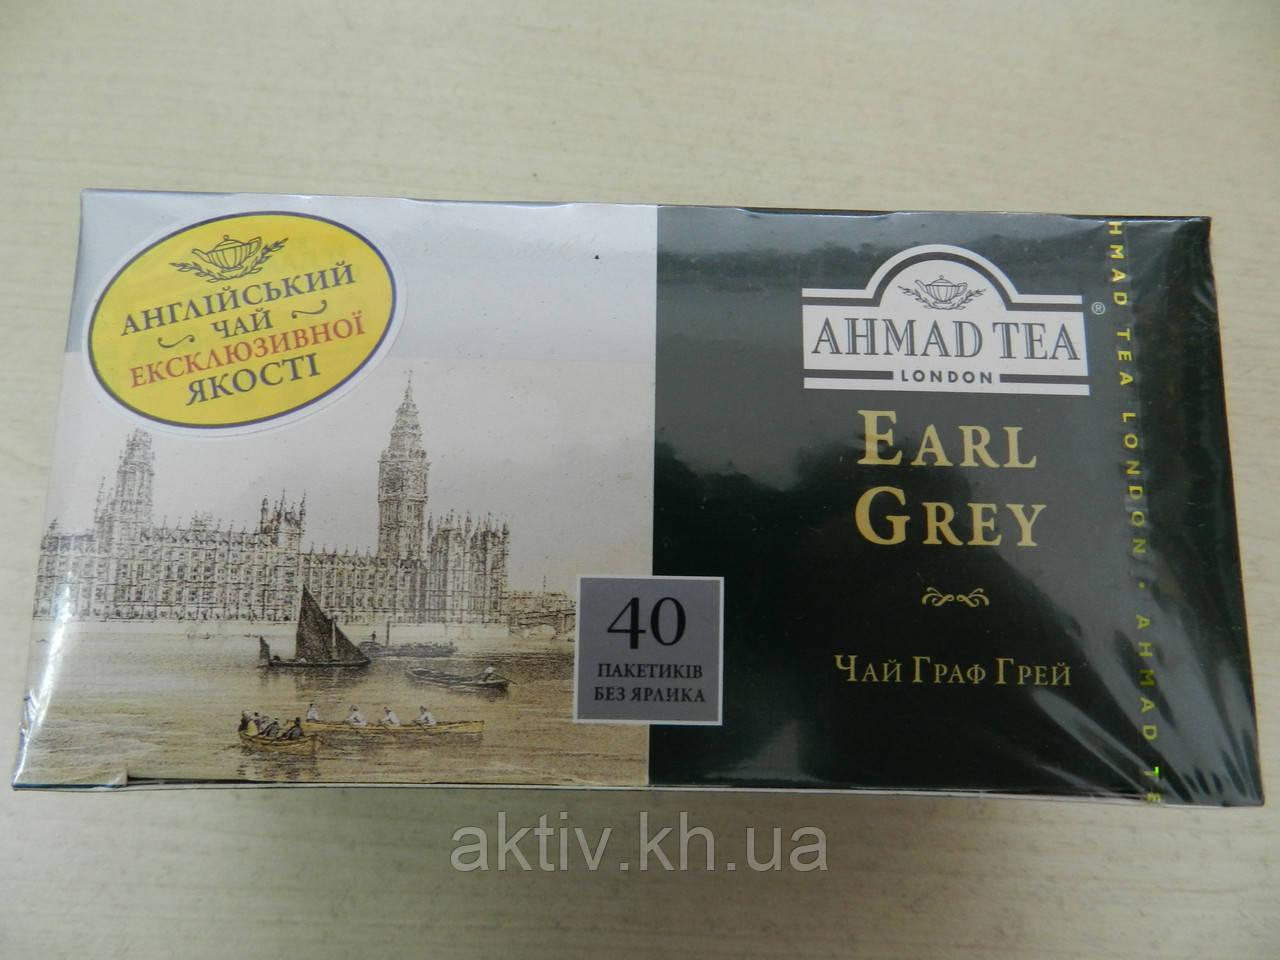 Чай Ахмад Эрл Грей 40 пакетиков